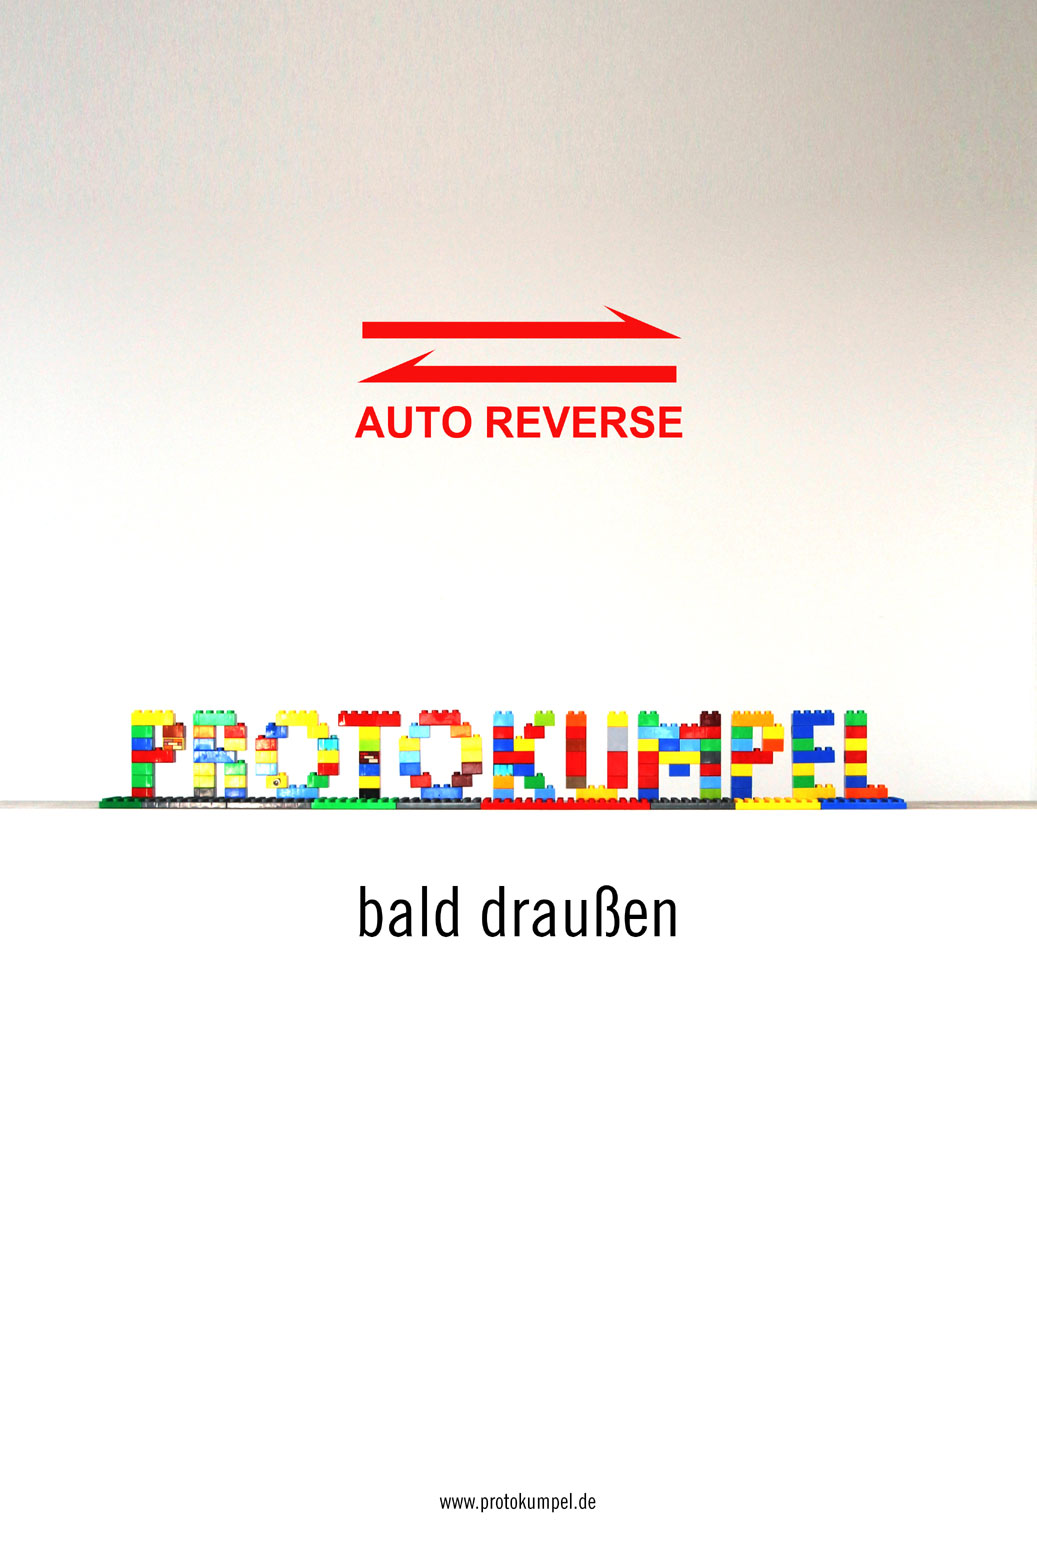 AUTO REVERSE - bald draussen!